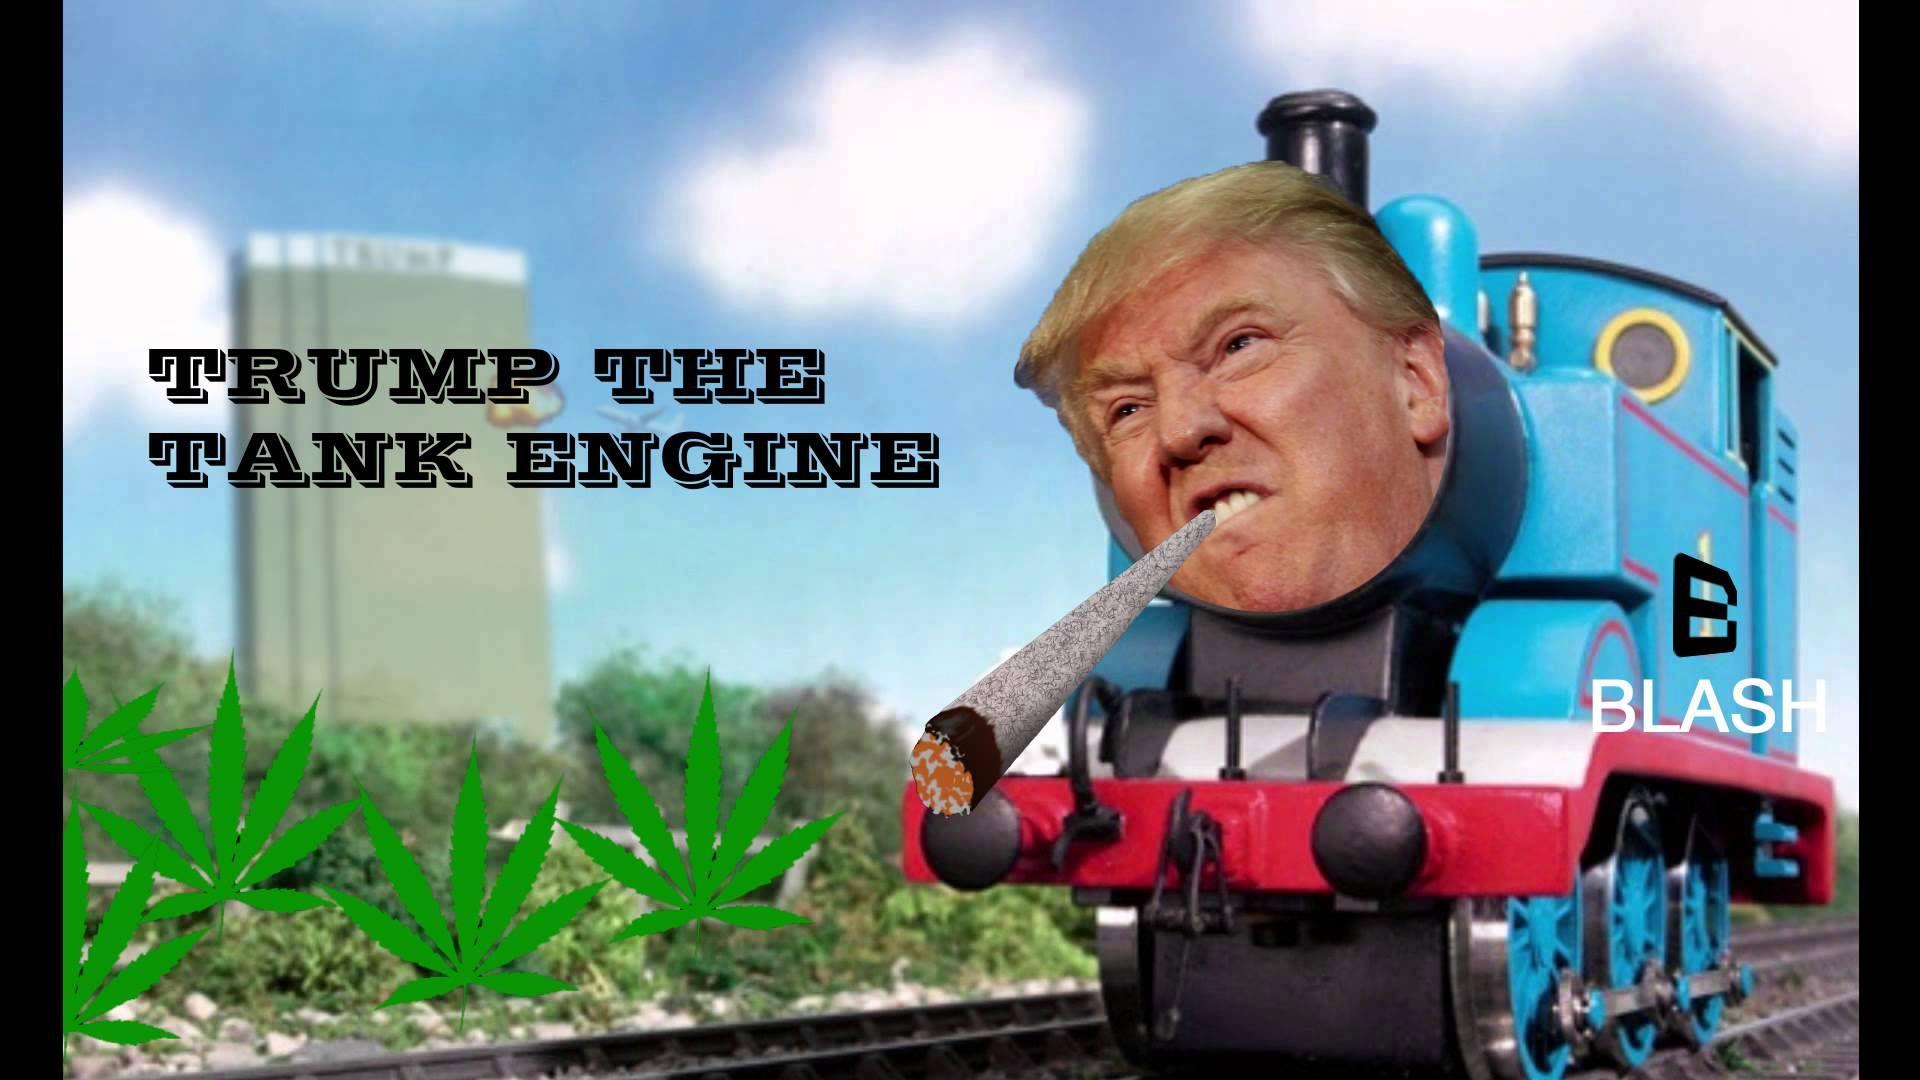 thomas the tank engine theme meme song remix